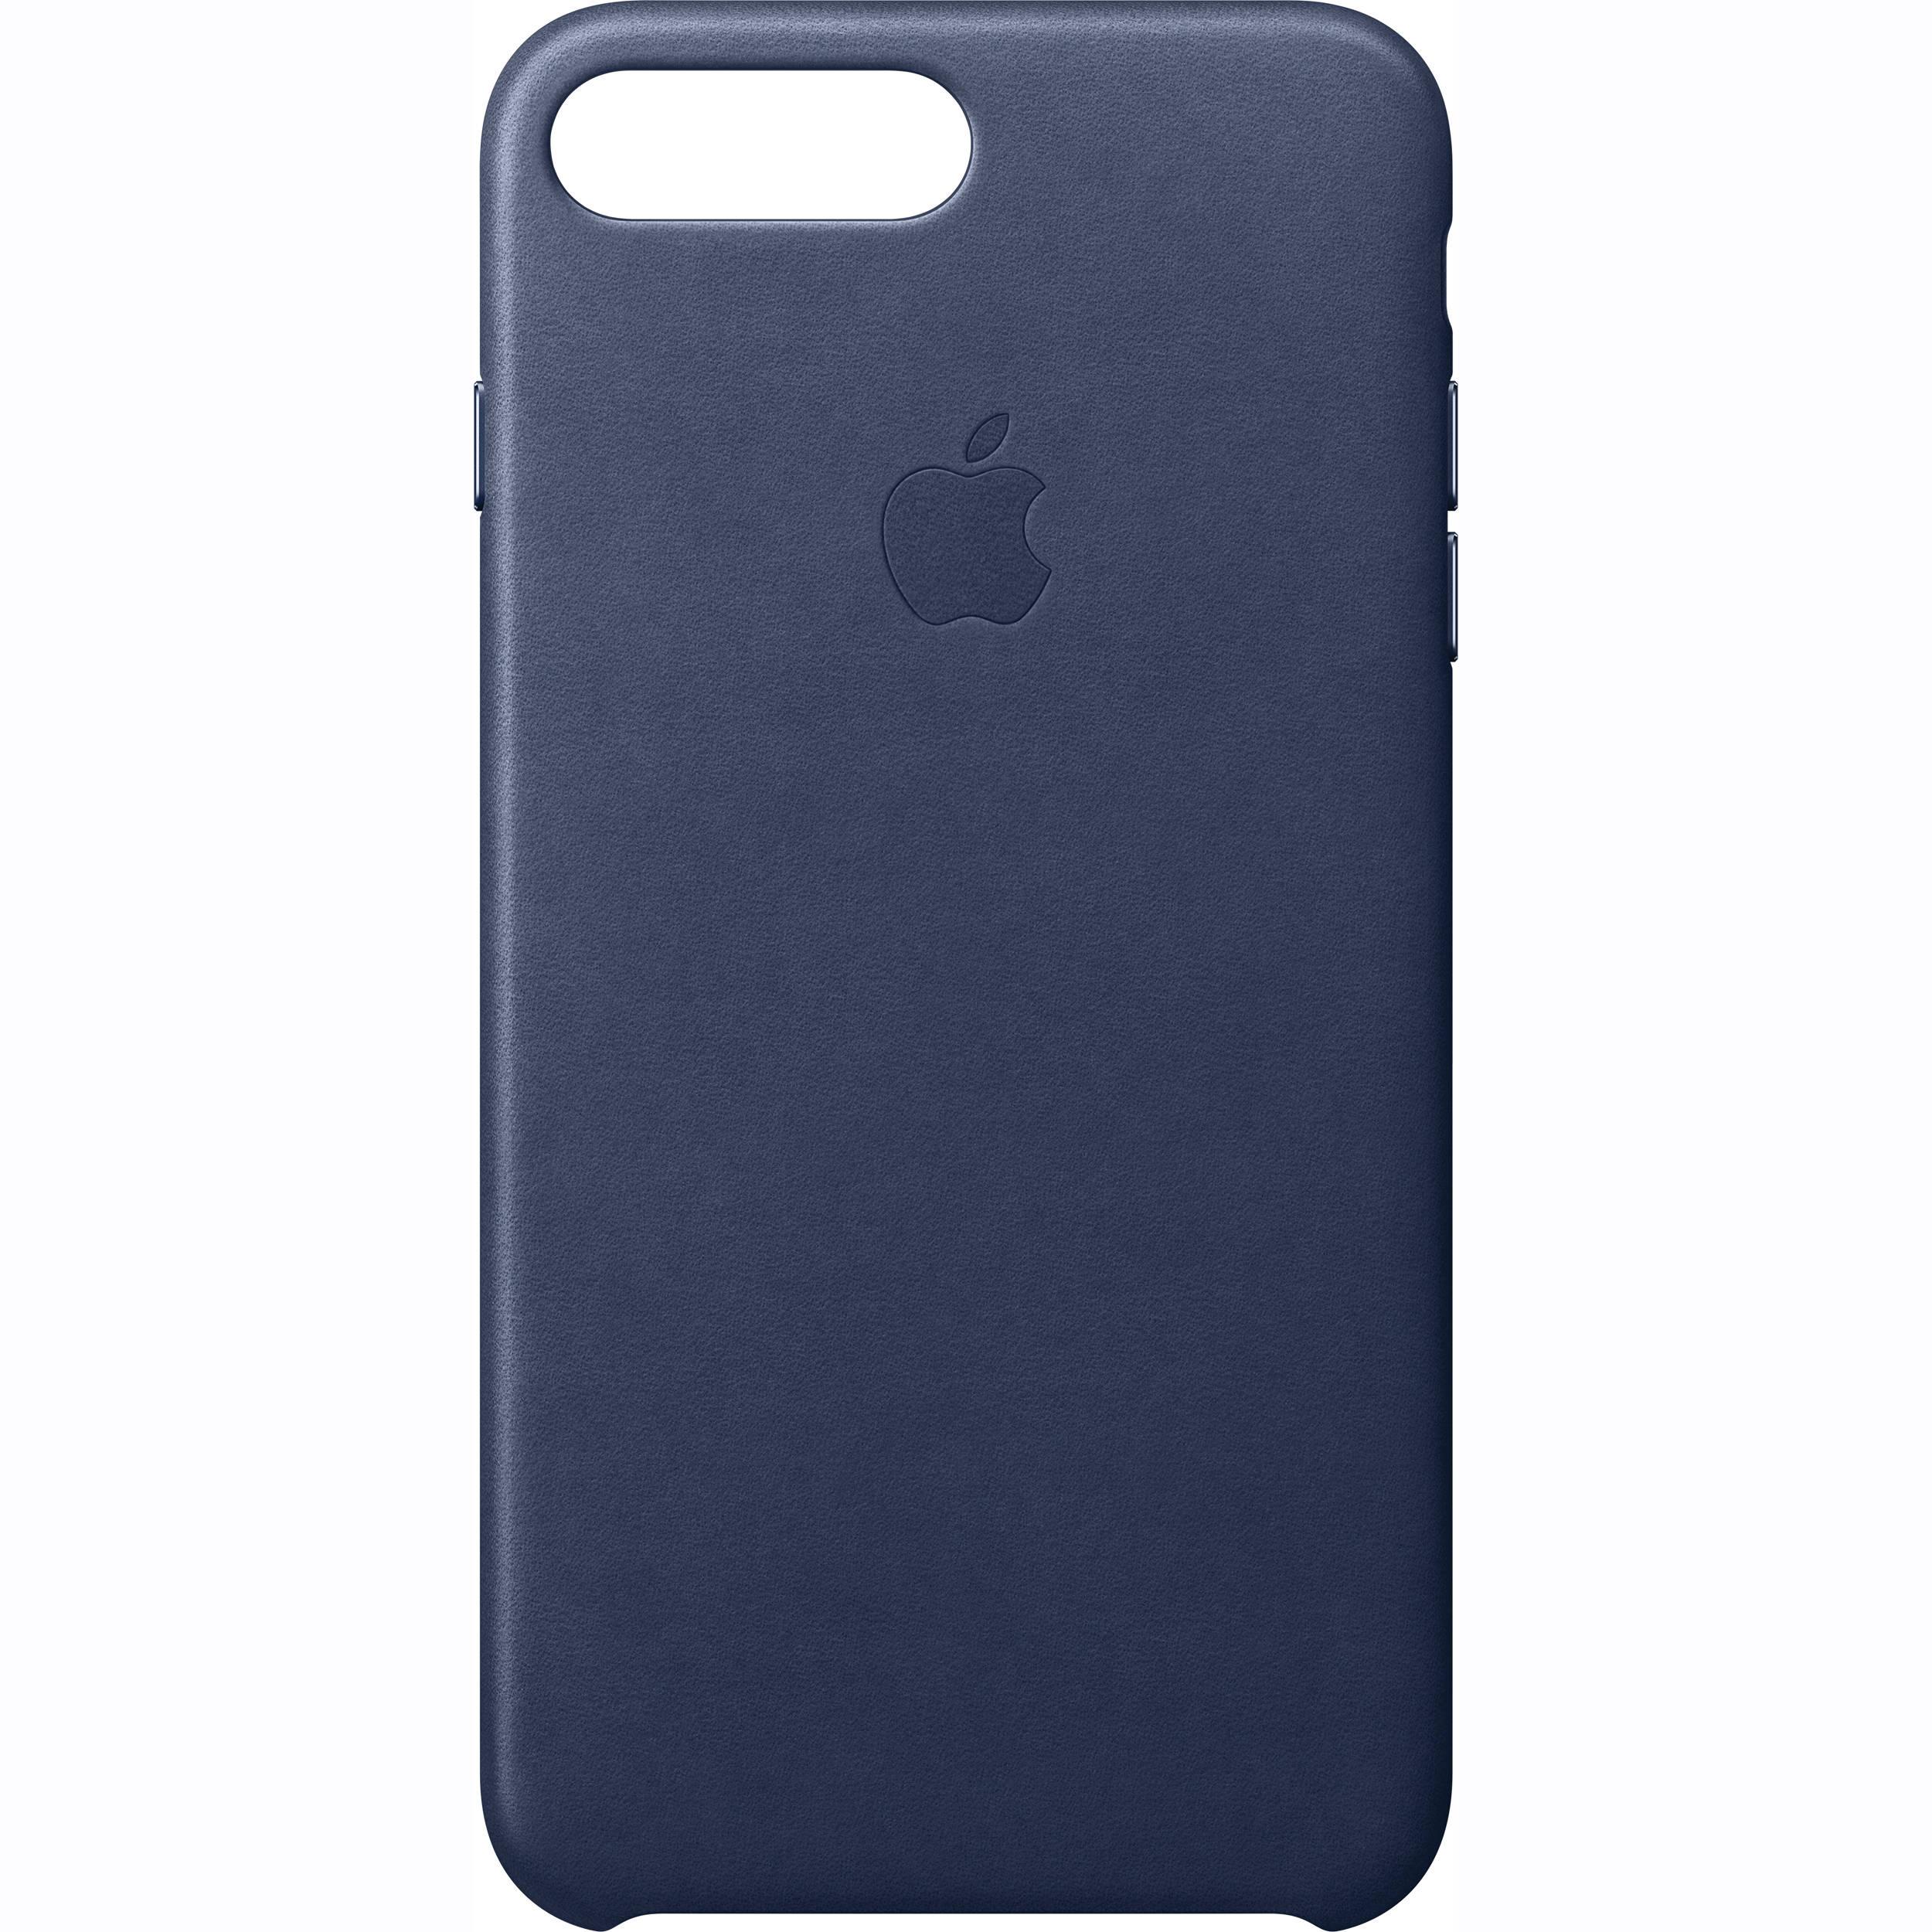 premium selection 447f6 23325 Apple iPhone 7 Plus Leather Case (Midnight Blue)